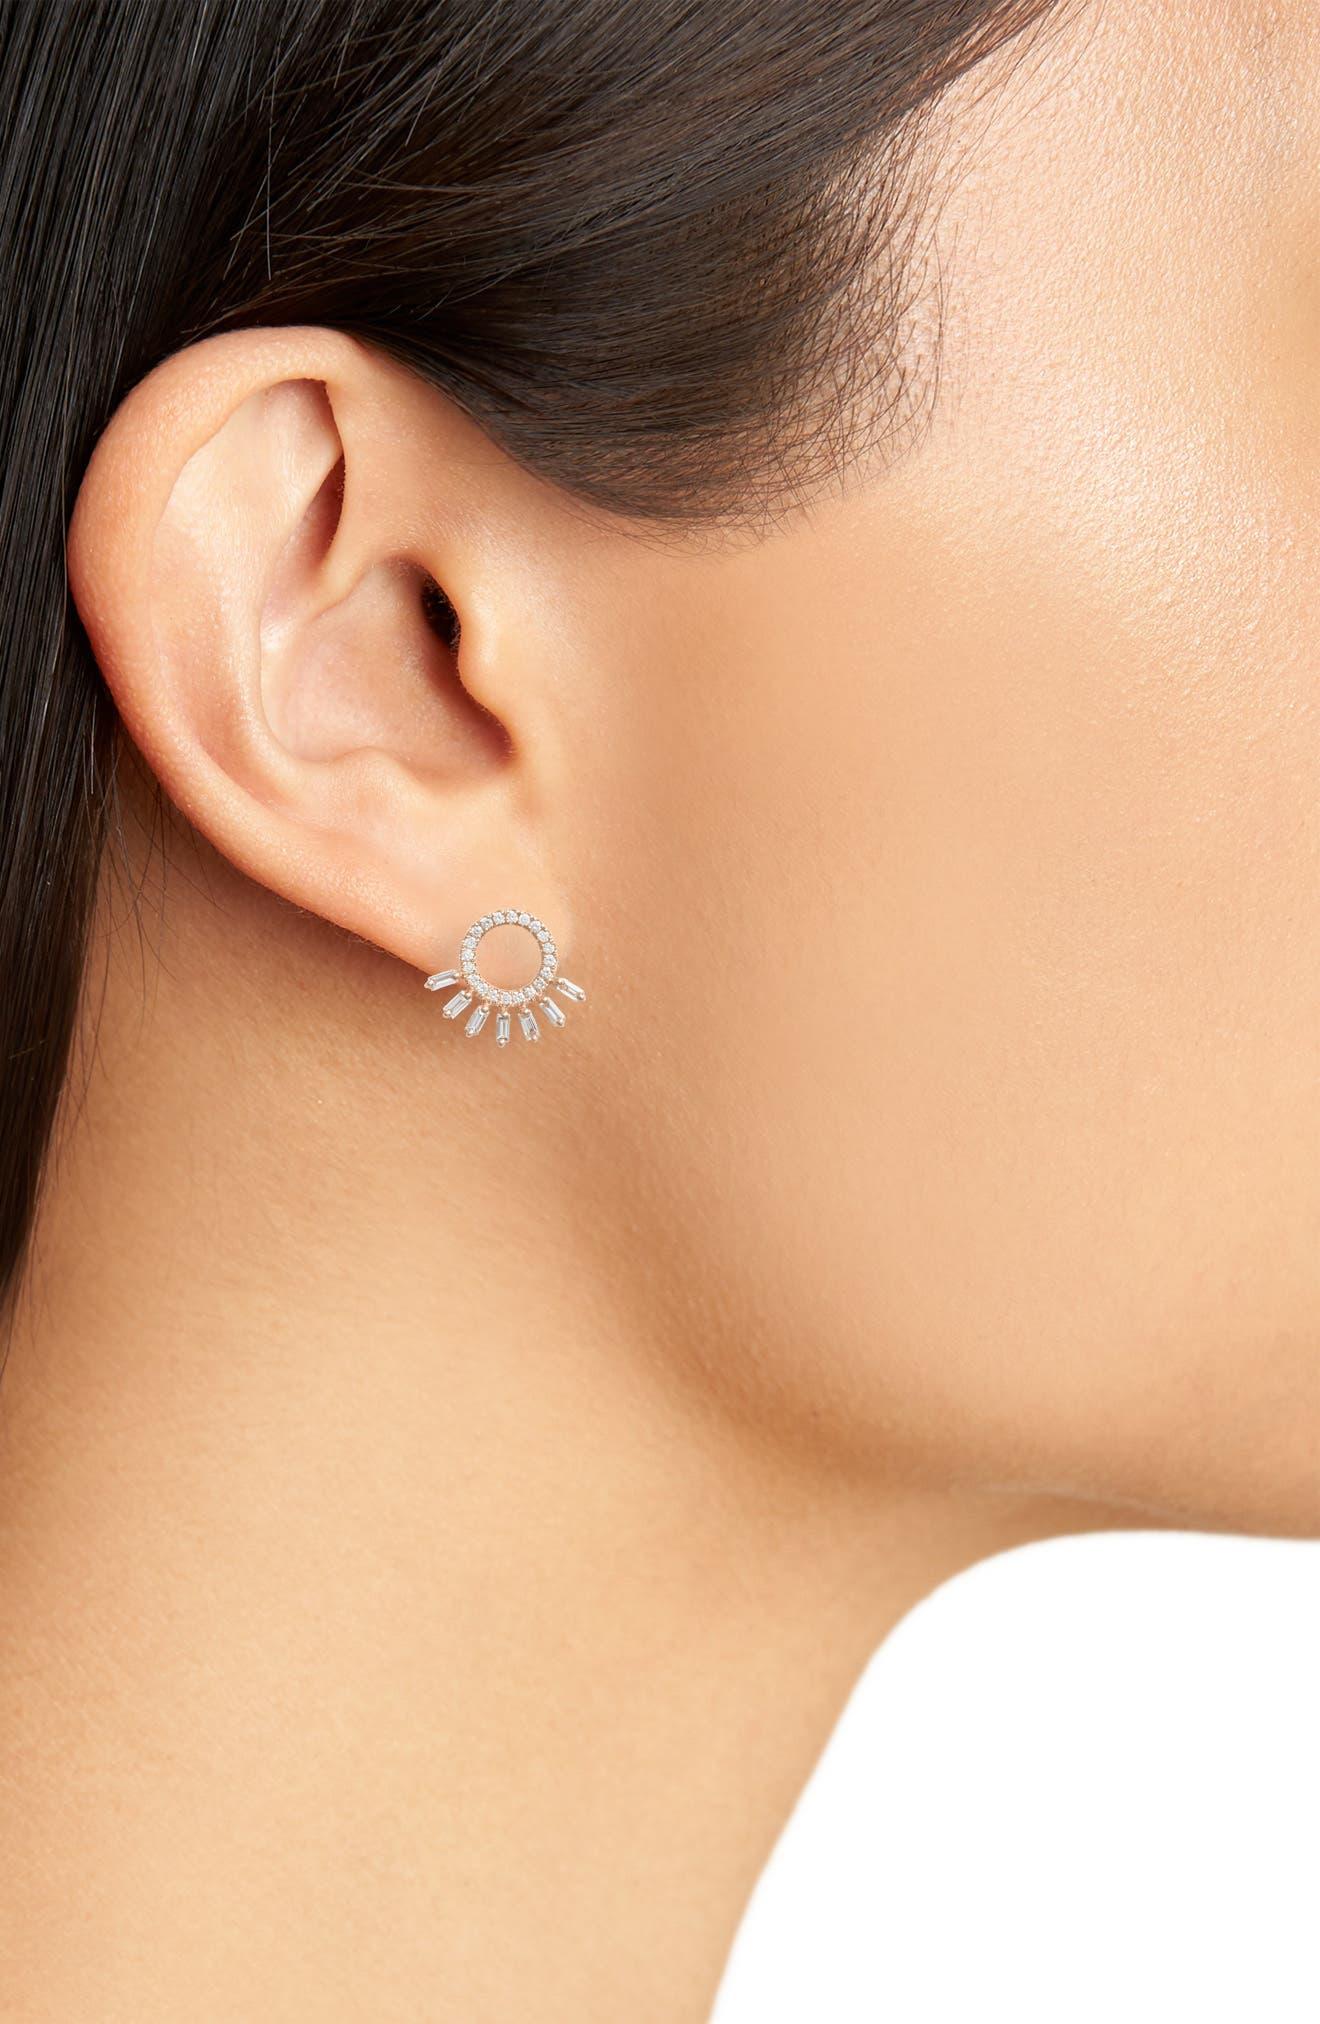 Dana Rebecca Sadie Starburst Stud Earrings,                             Alternate thumbnail 2, color,                             ROSE GOLD